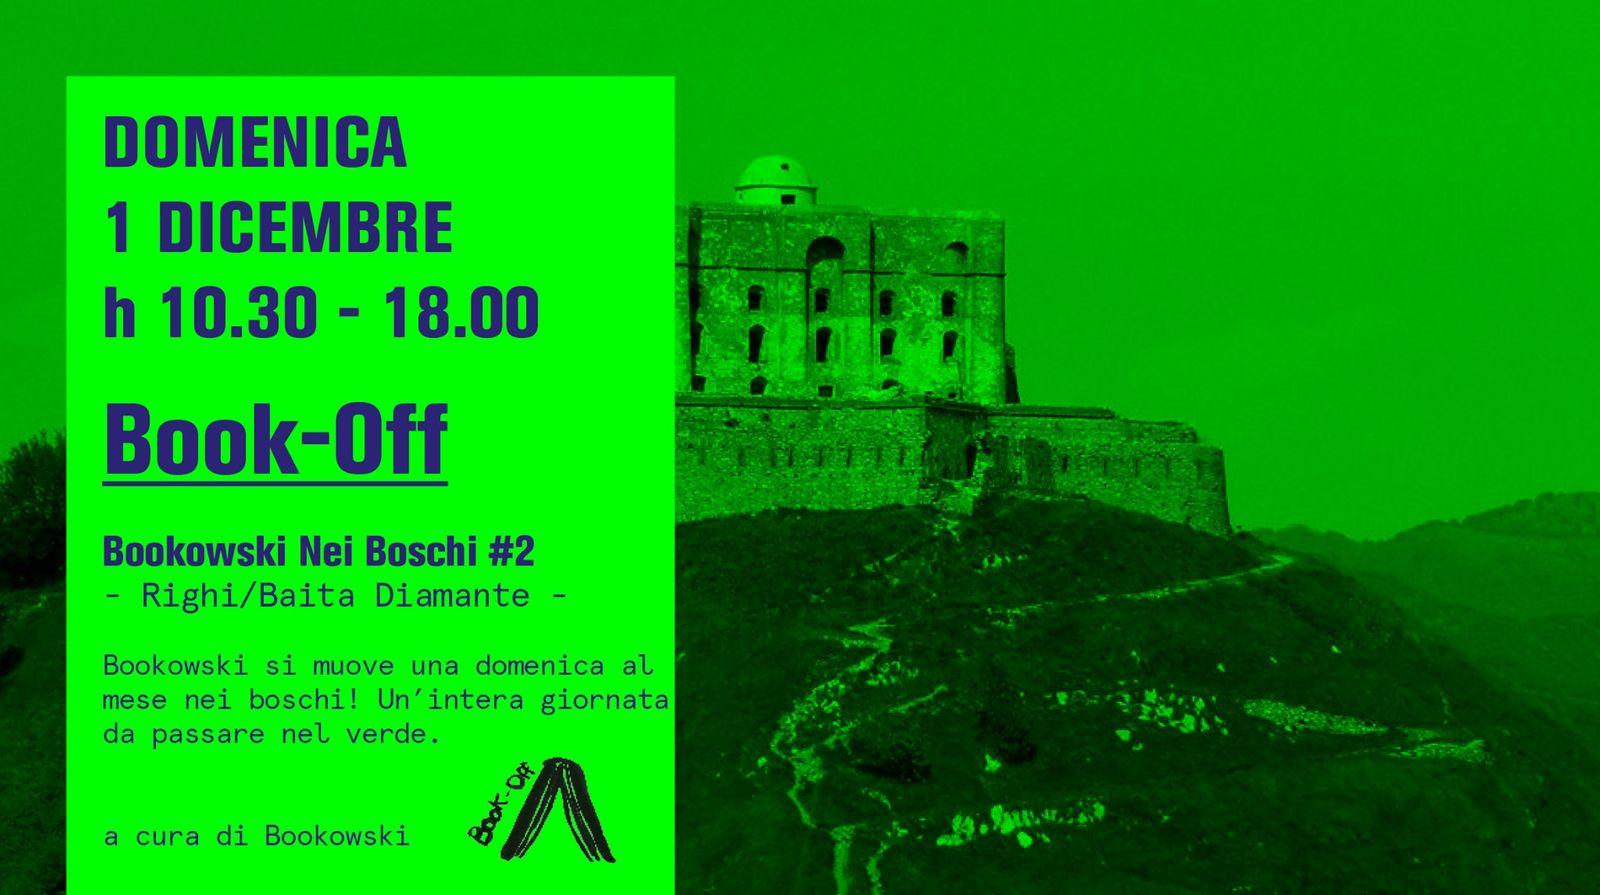 Book-off/Bookowski Nei Boschi #2